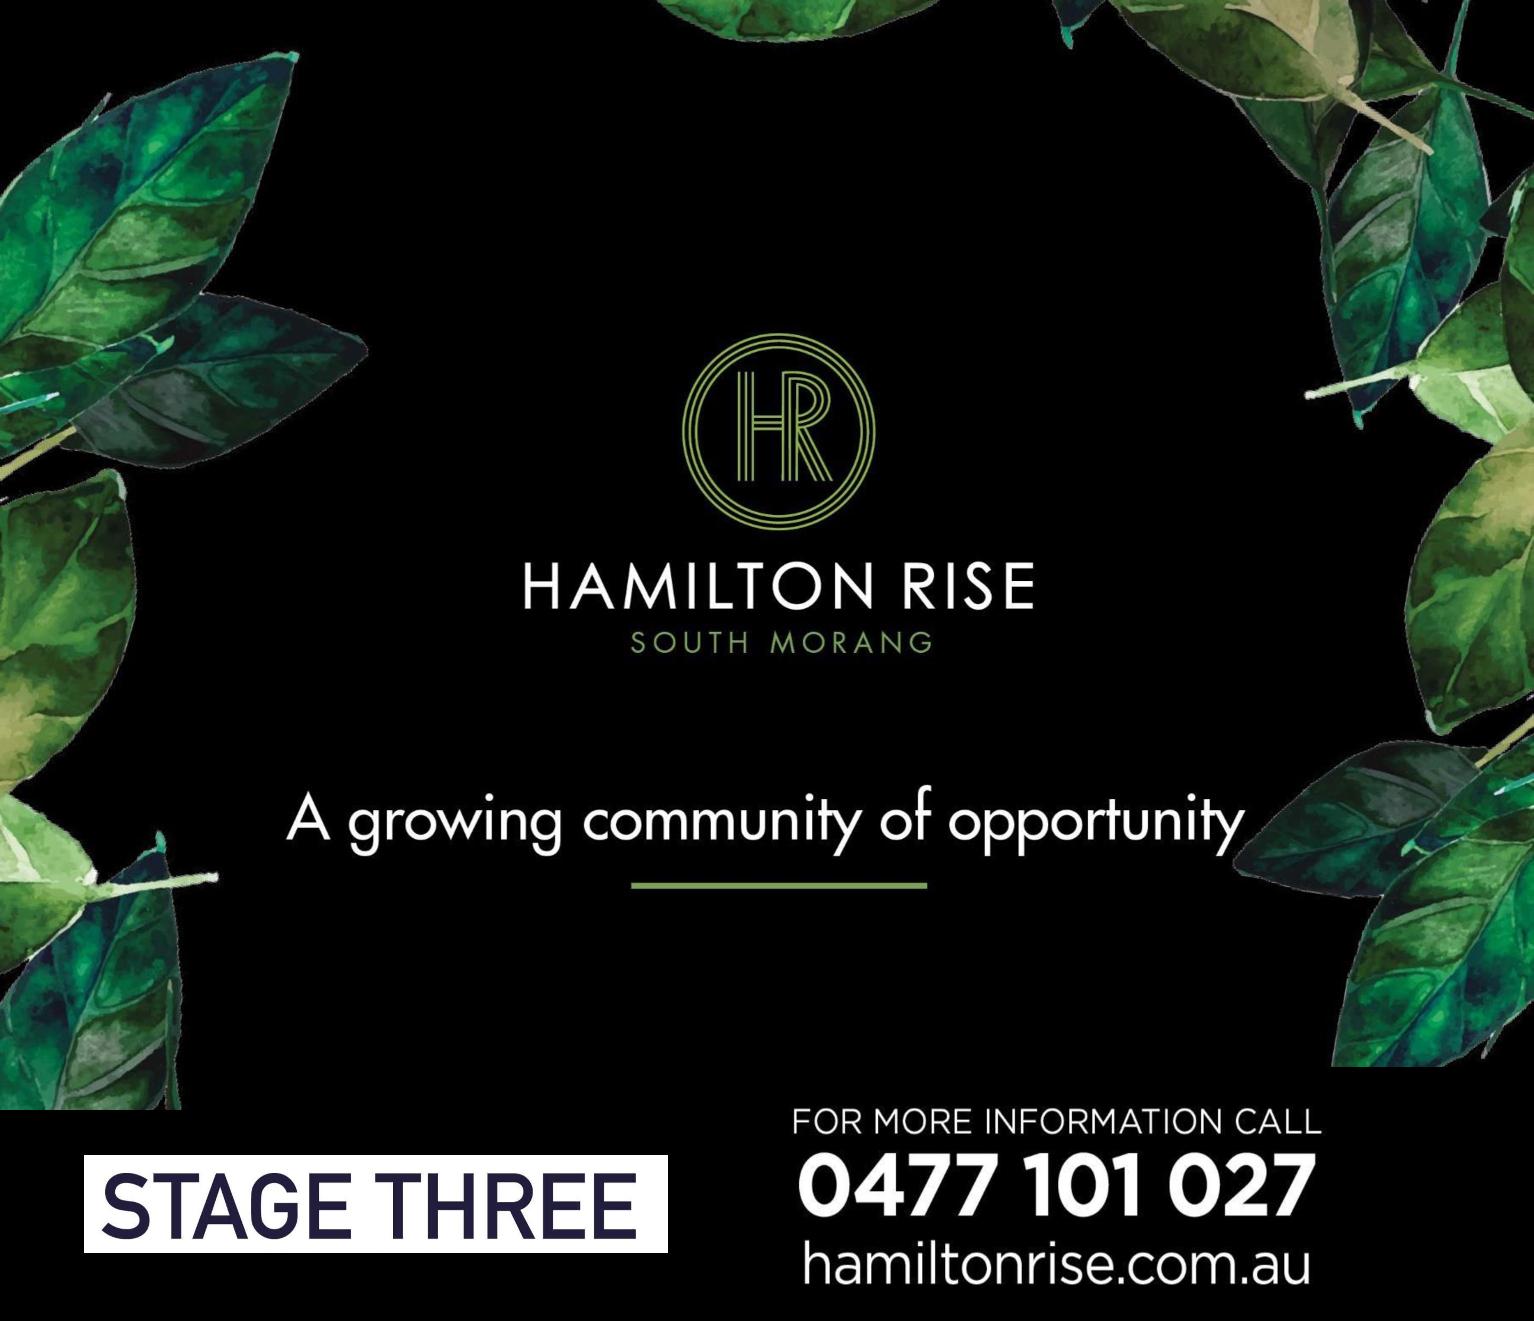 Hamilton Rise